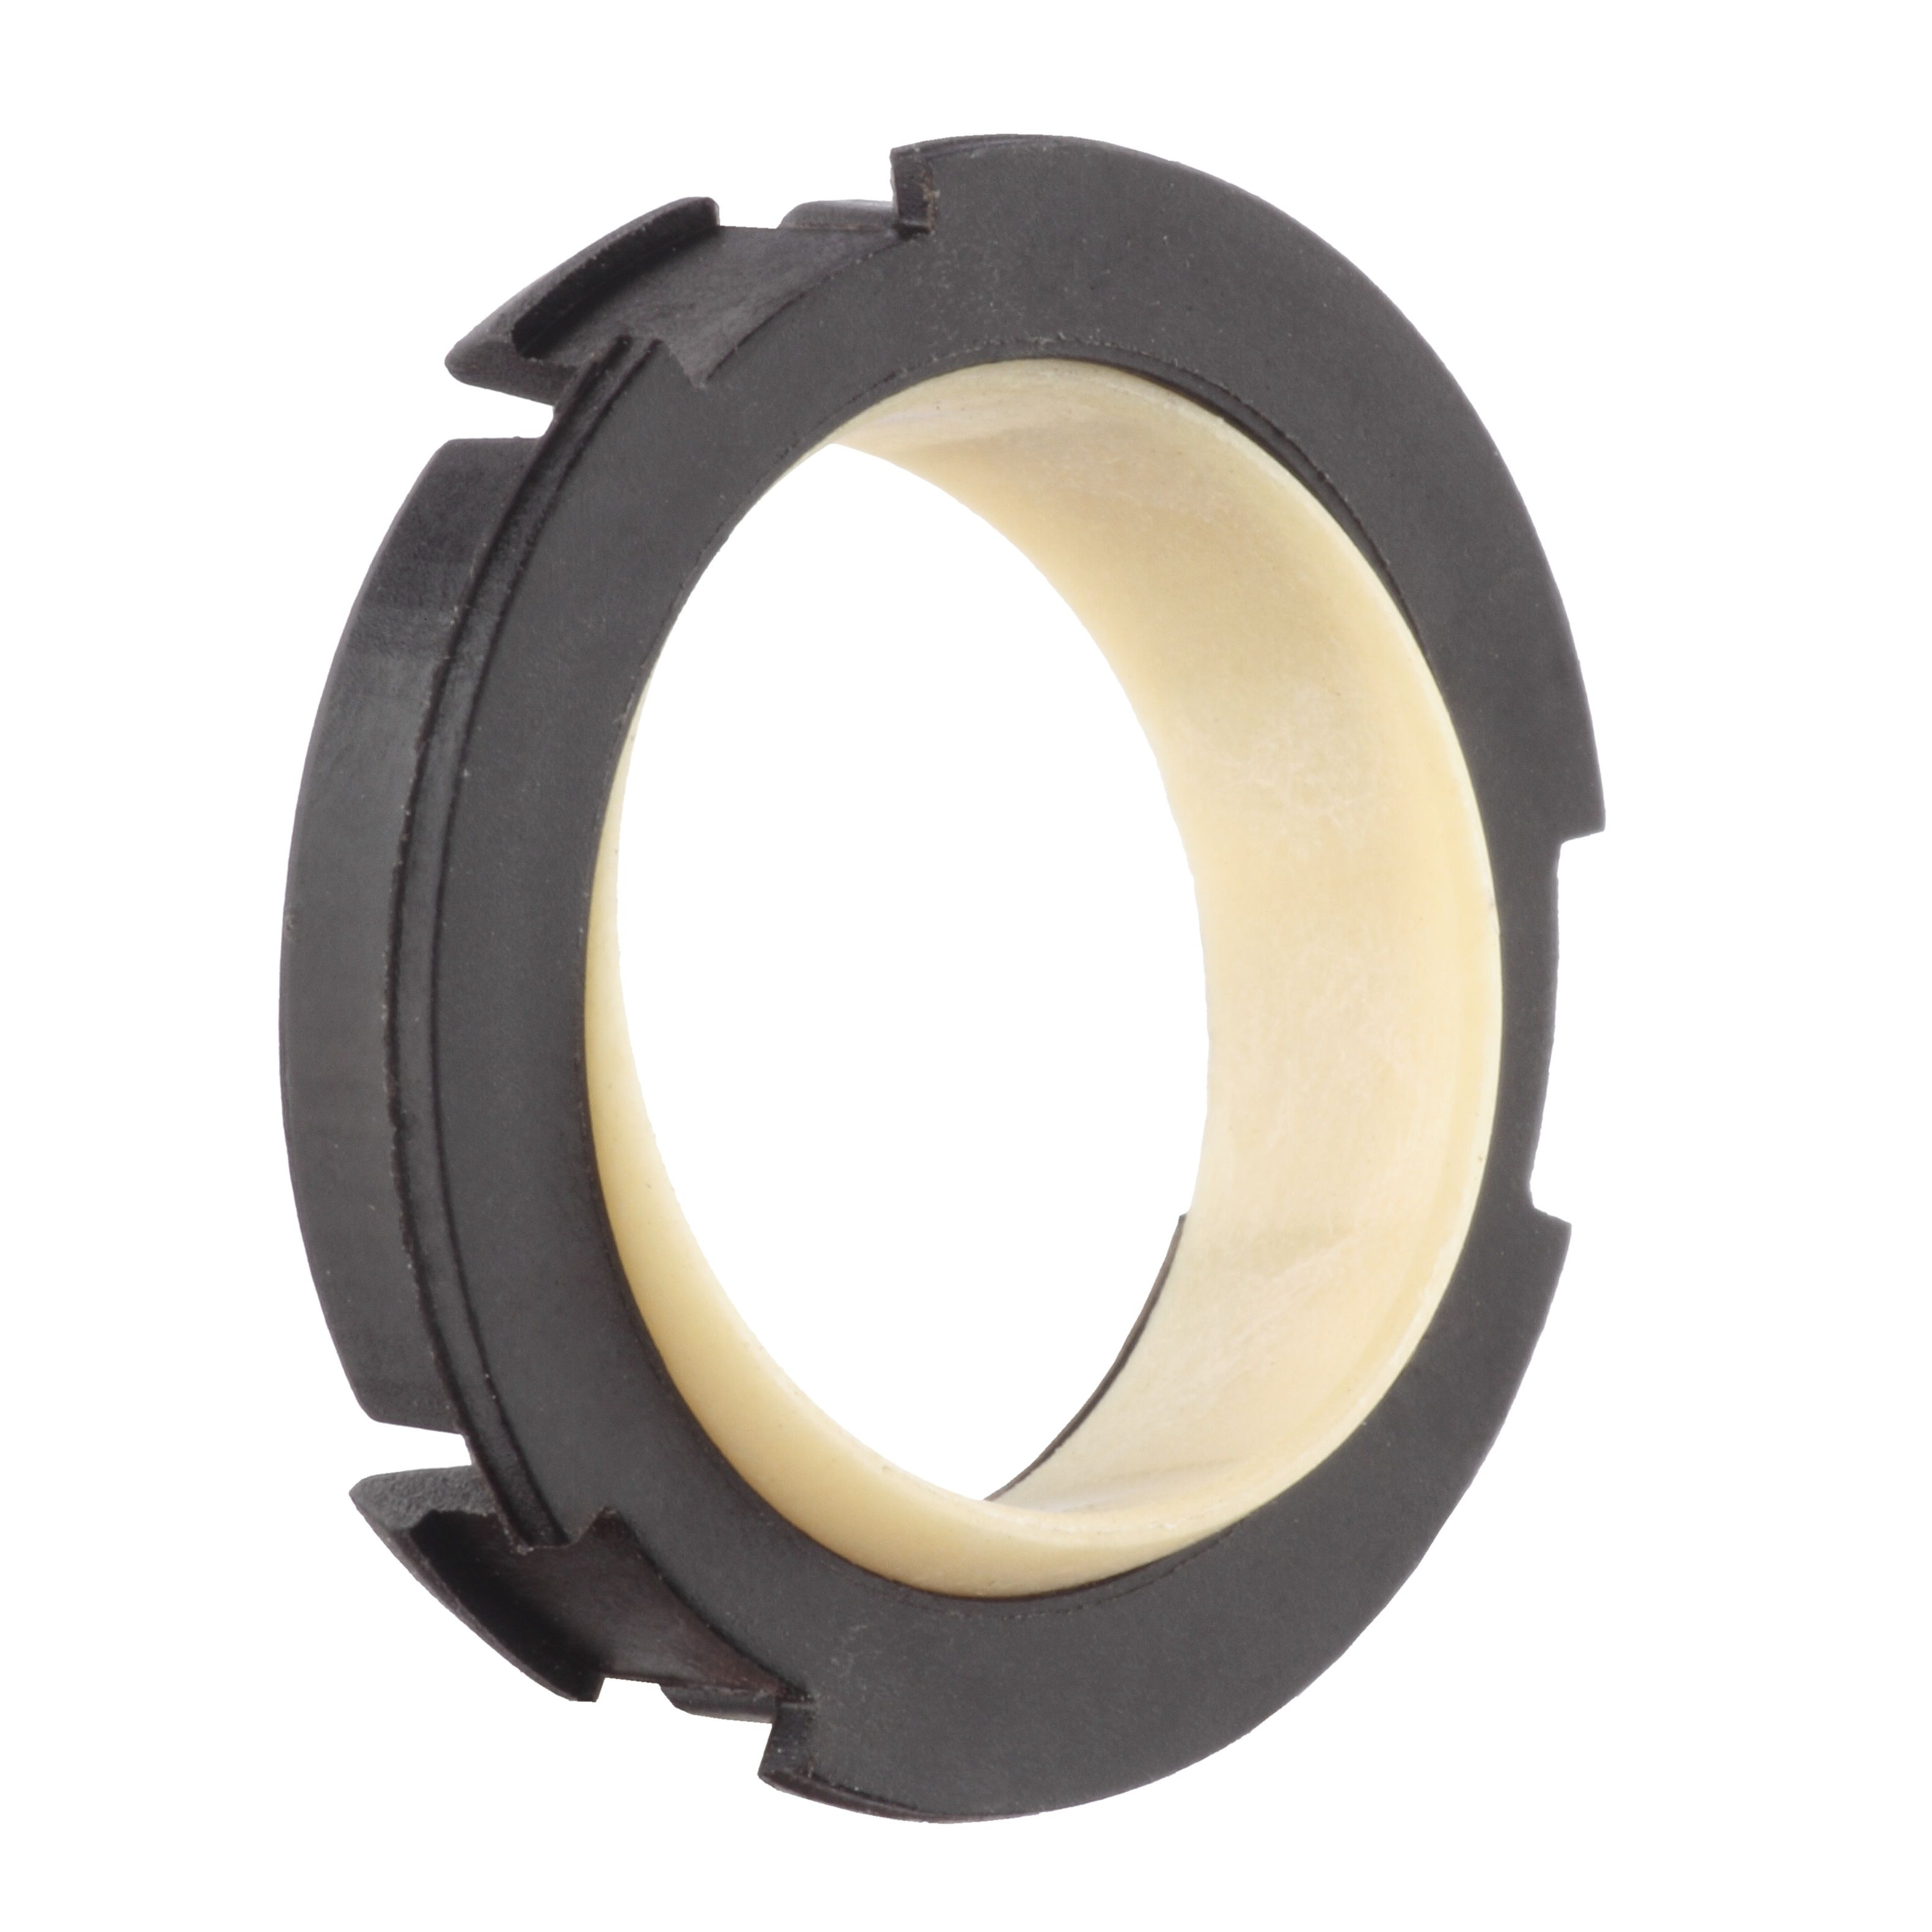 double flange bearing. igubal pressfit spherical double flange bearing: clip on. bearing